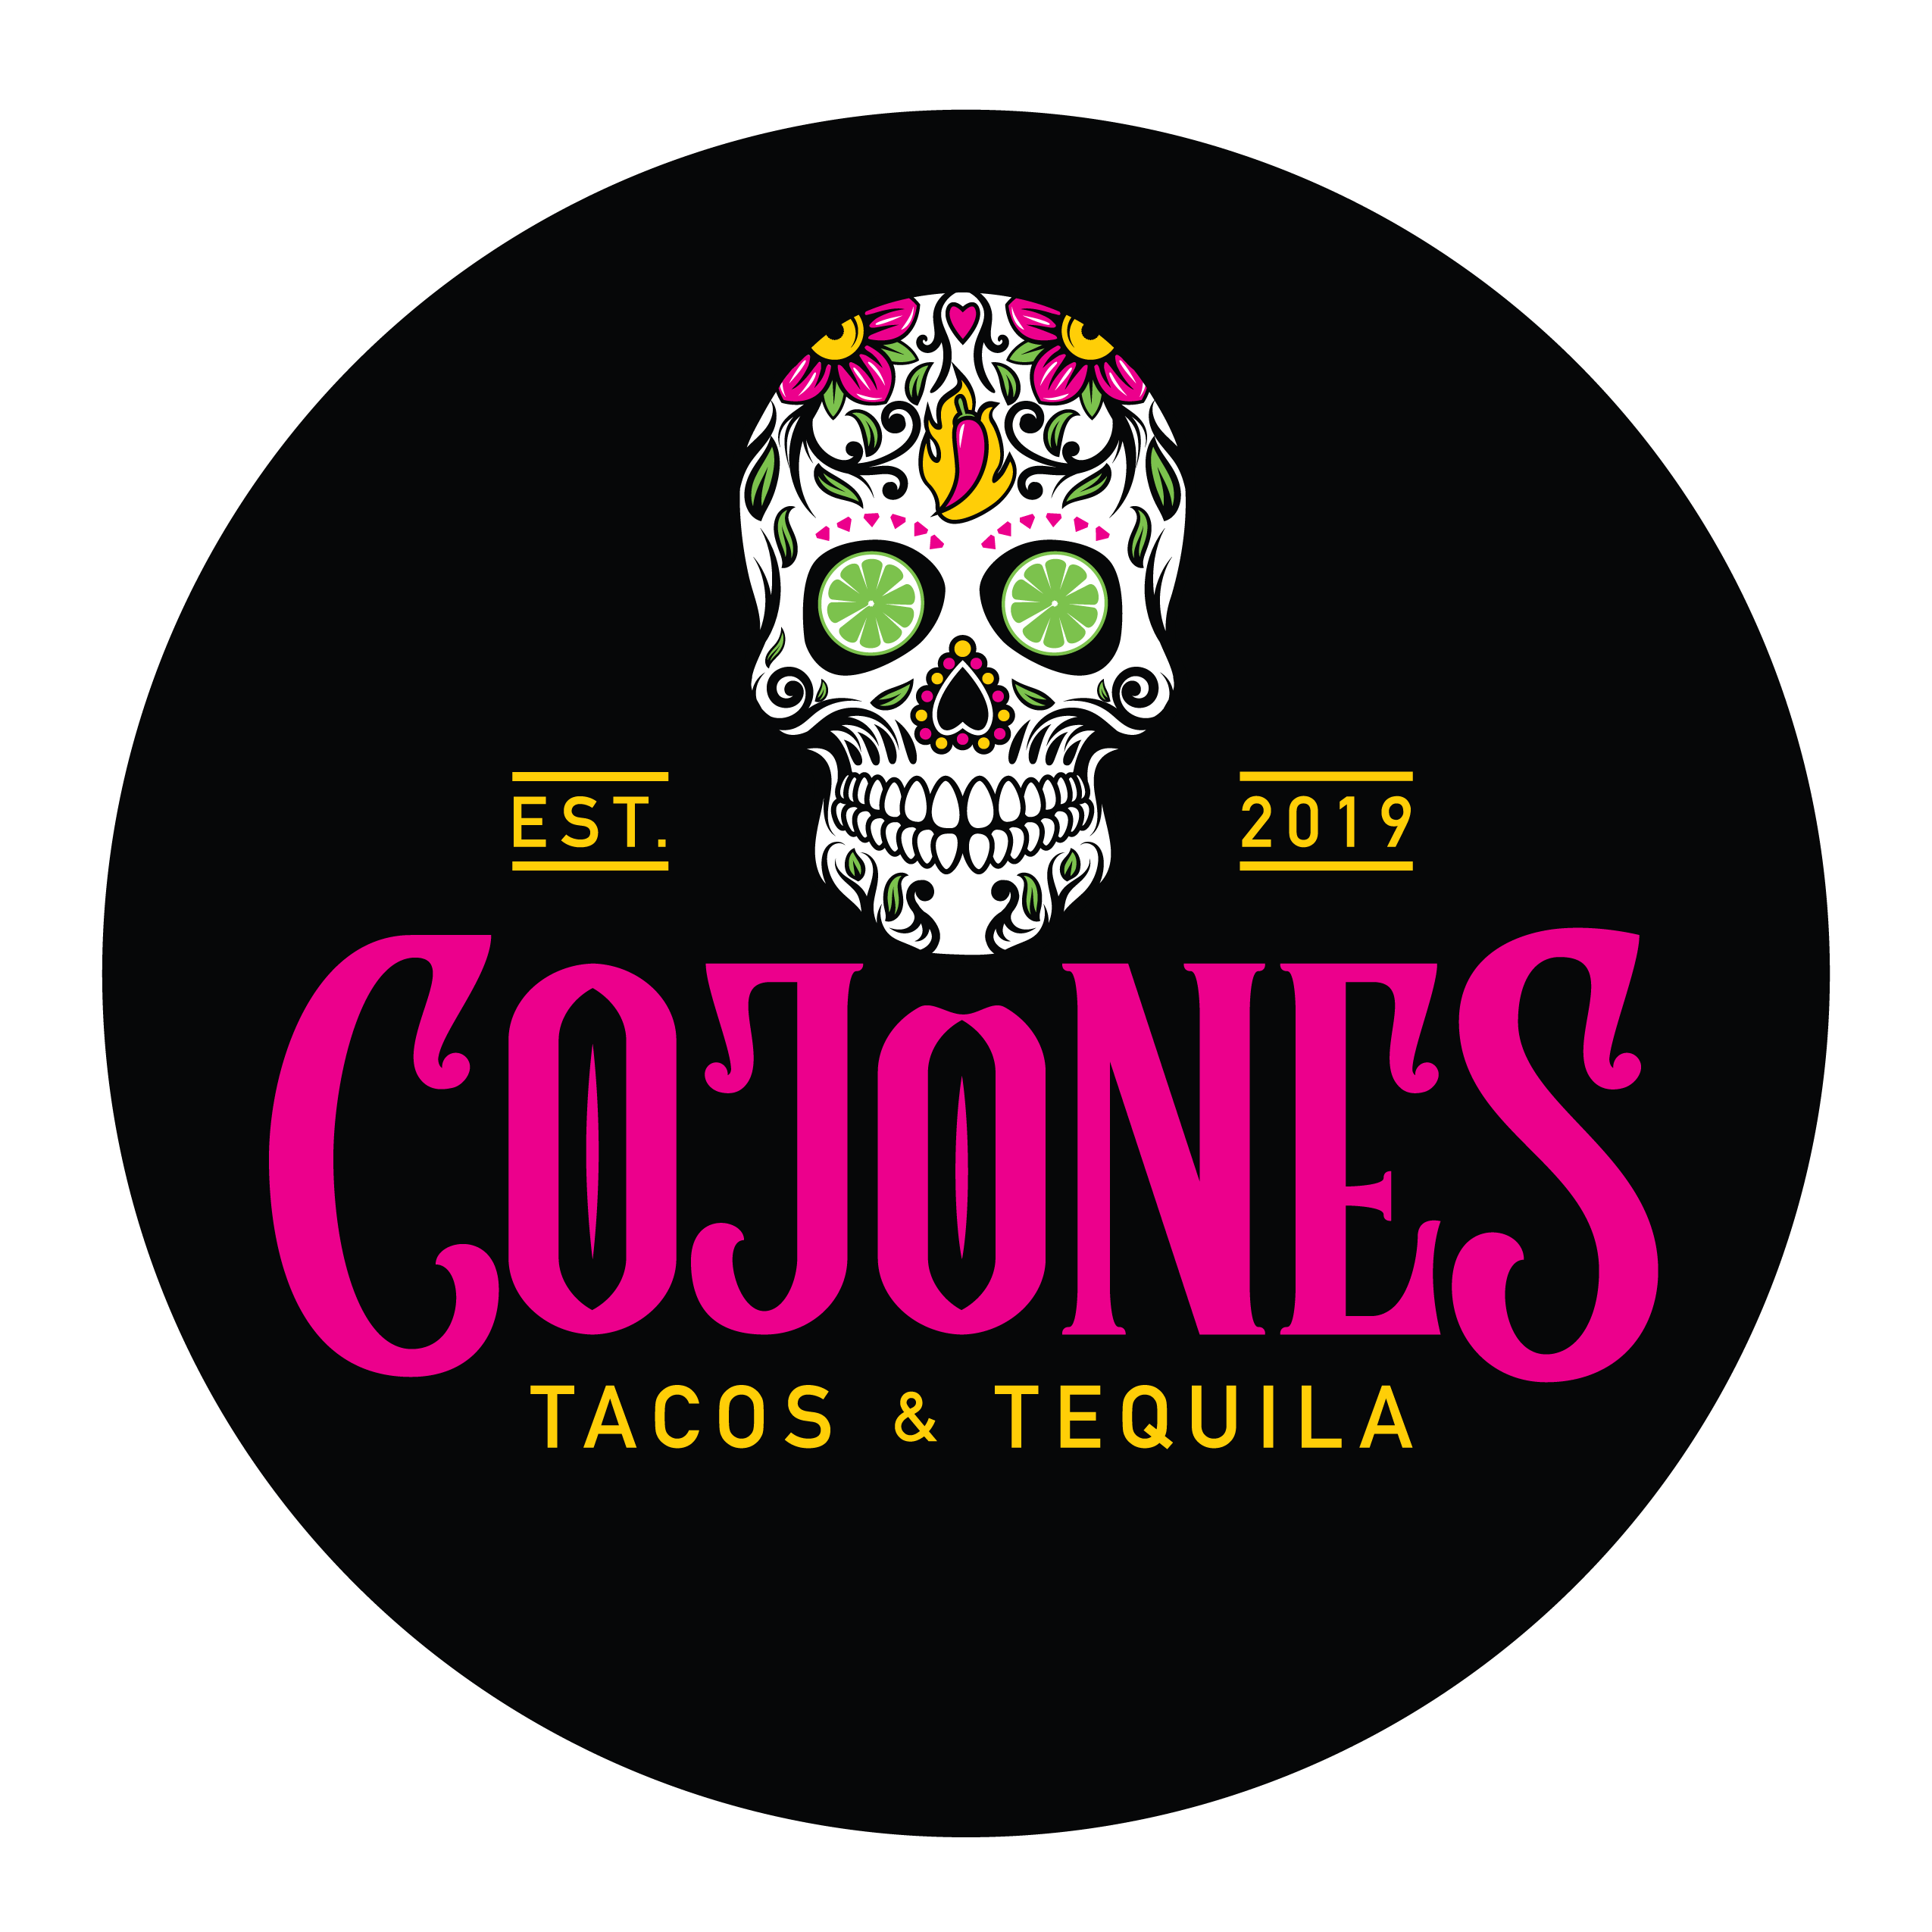 Cojones logo button